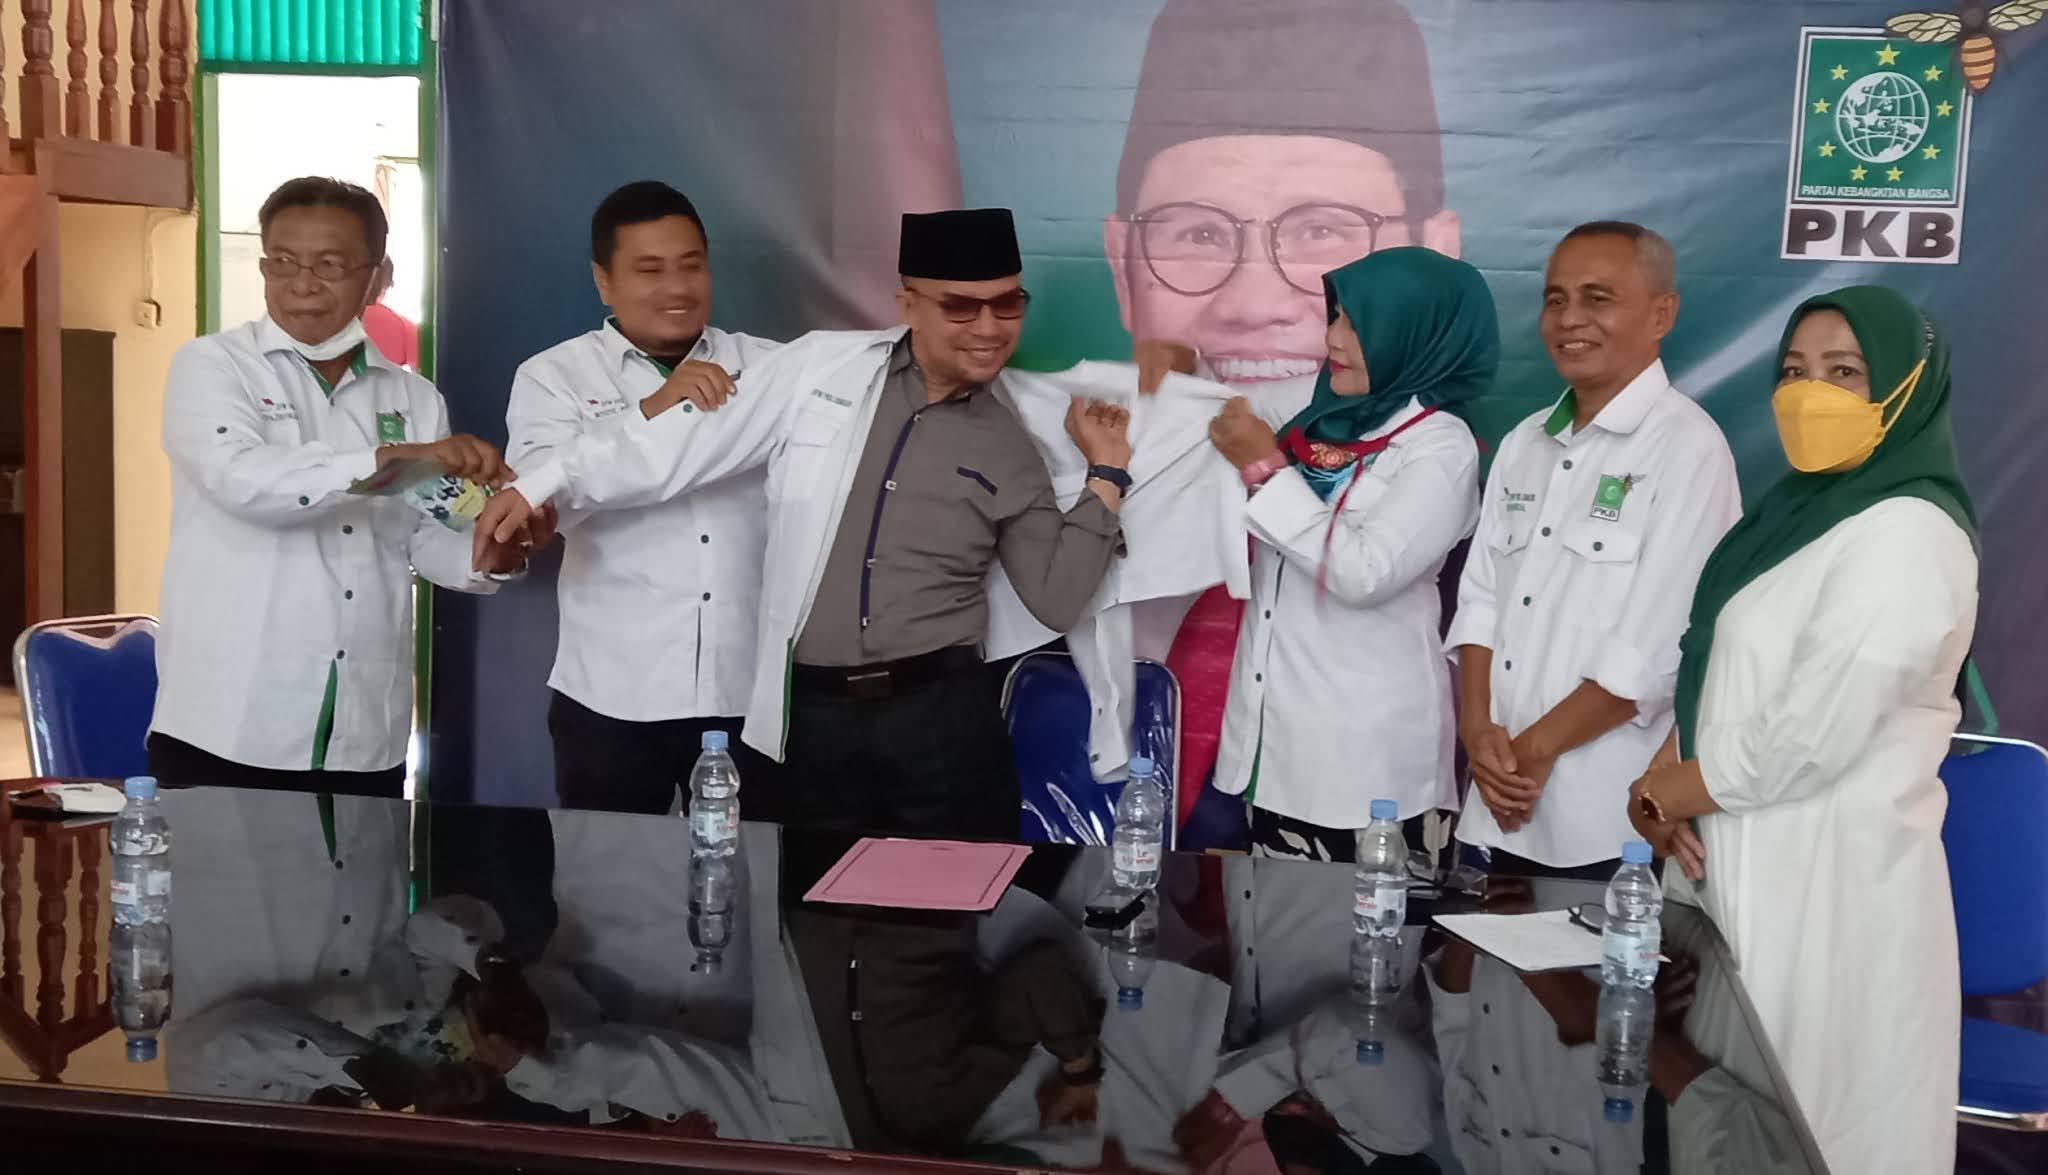 Dipasangkan Baju oleh Ketua Garda Bangsa Sumbar, H Martias Resmi Masuk PKB, Kader Tersenyum Sumringah